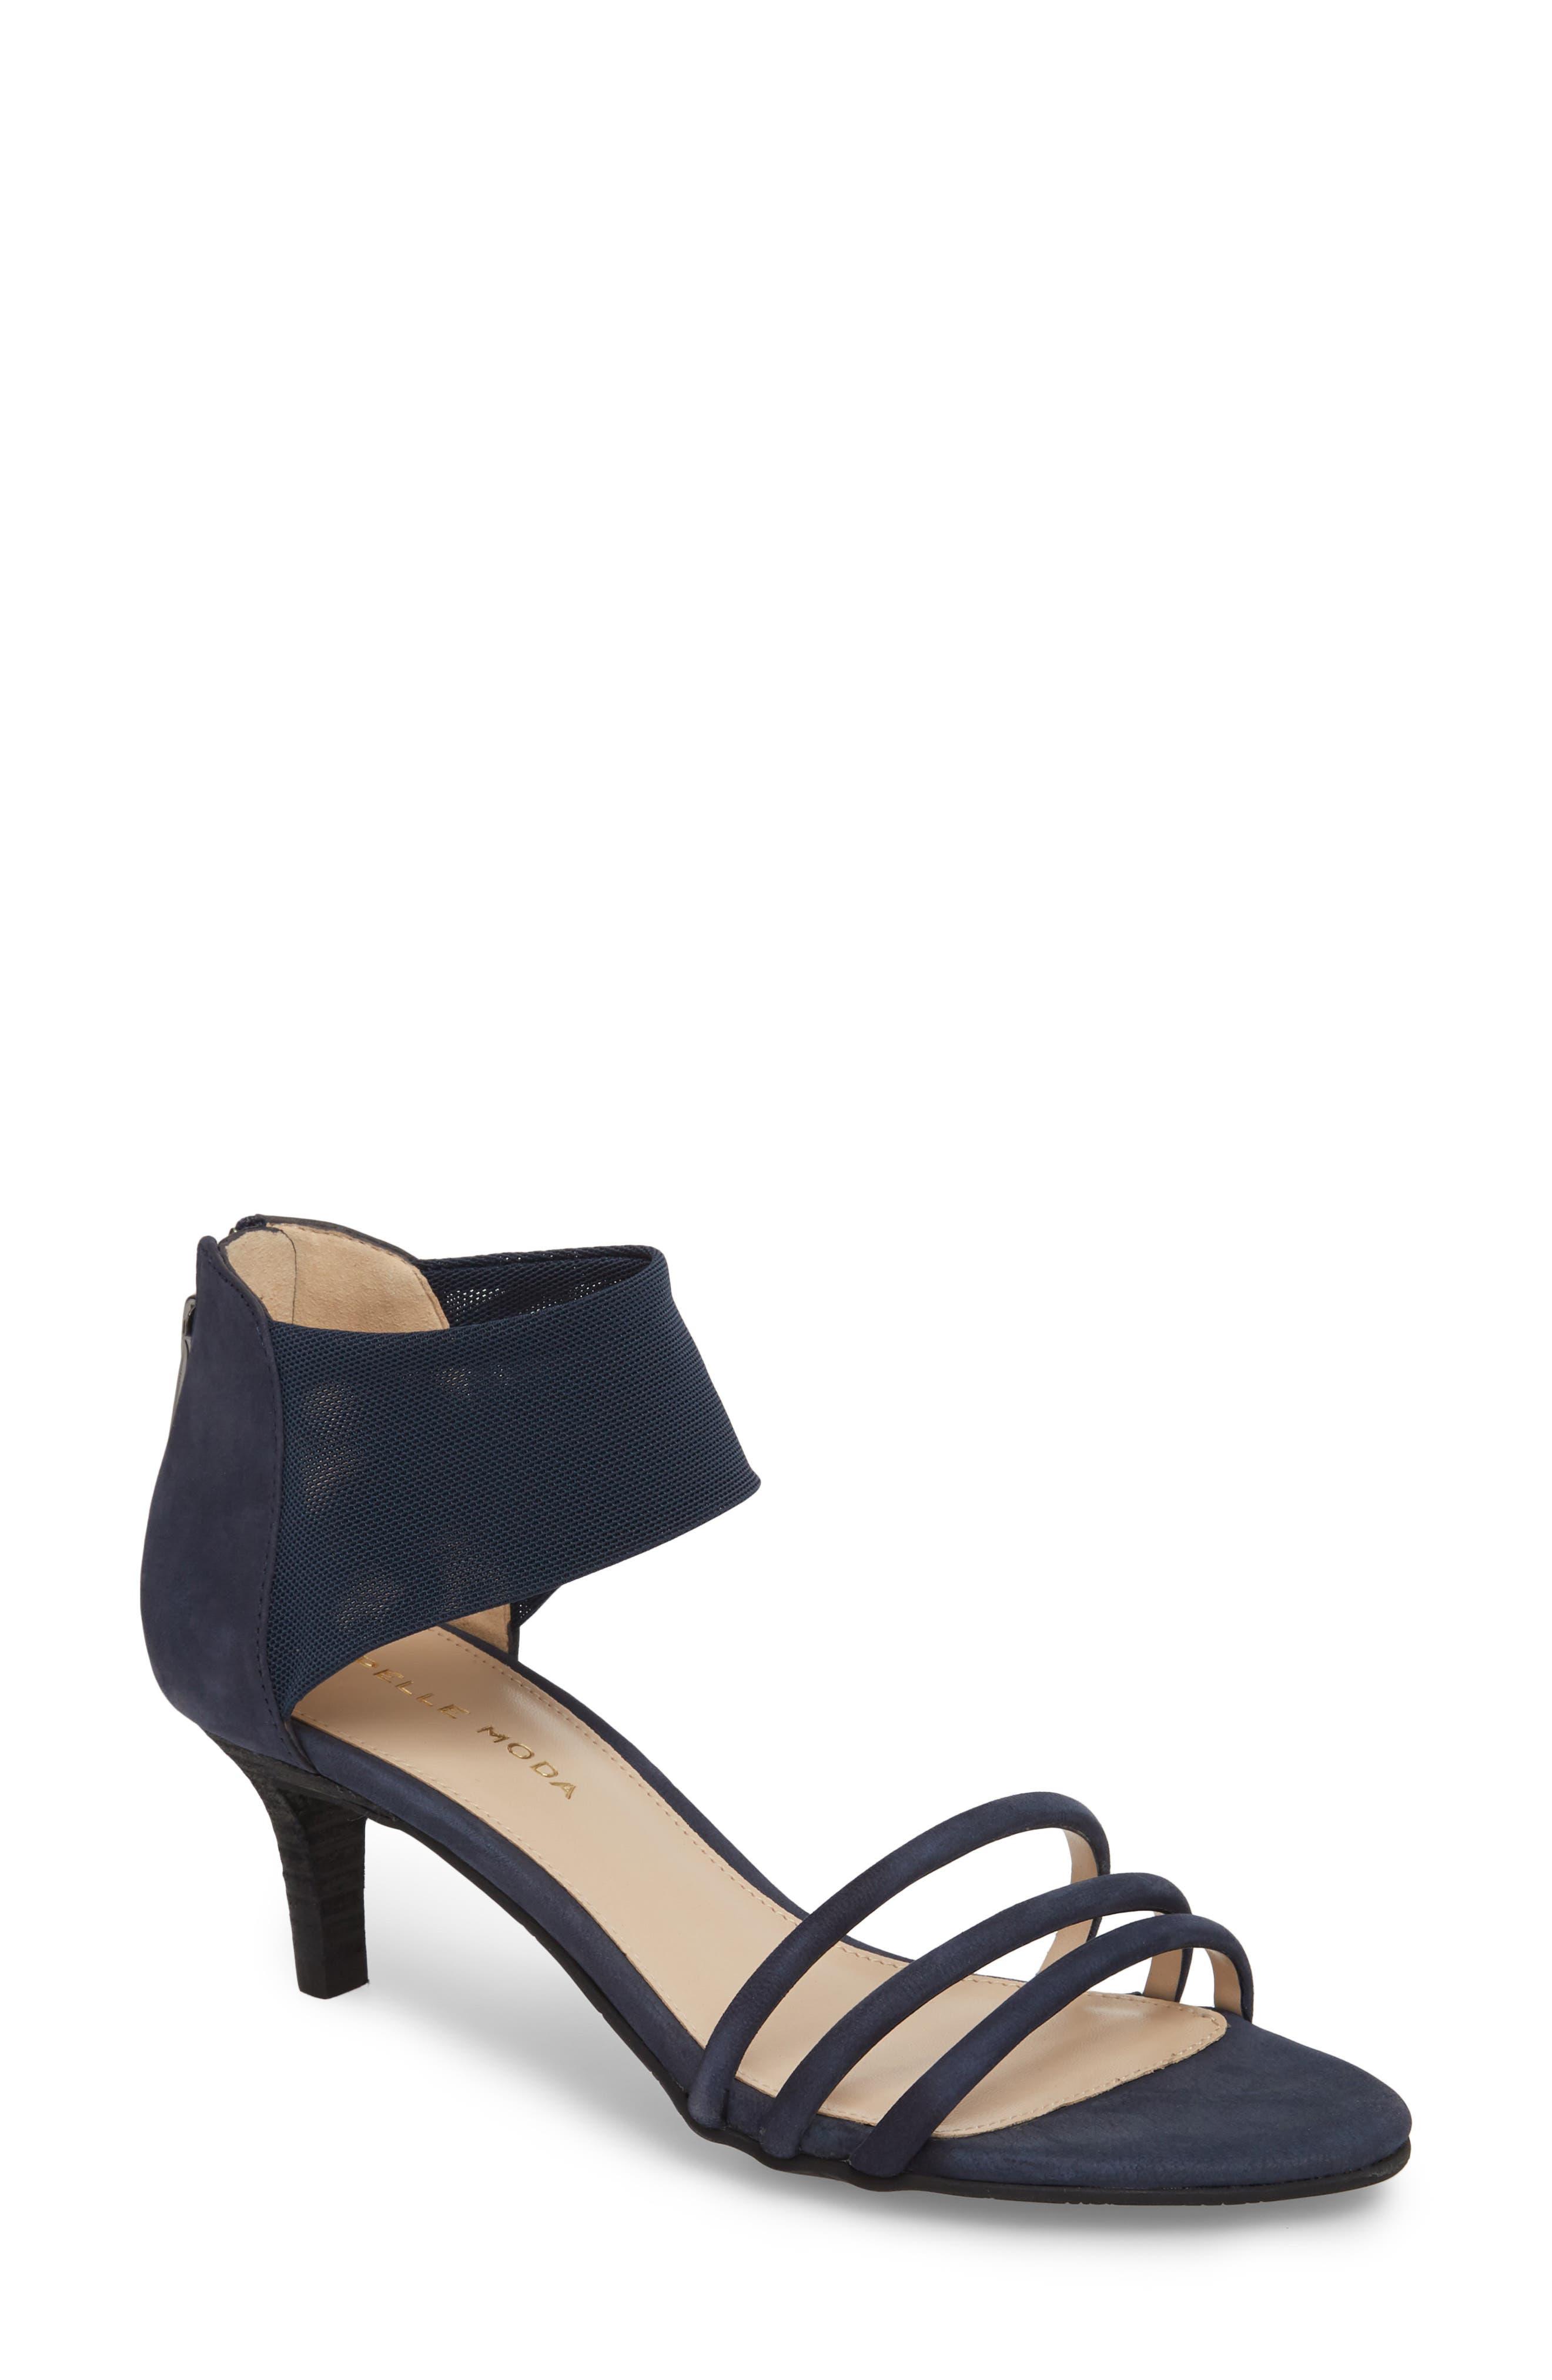 Berri Ankle Cuff Sandal,                             Main thumbnail 3, color,